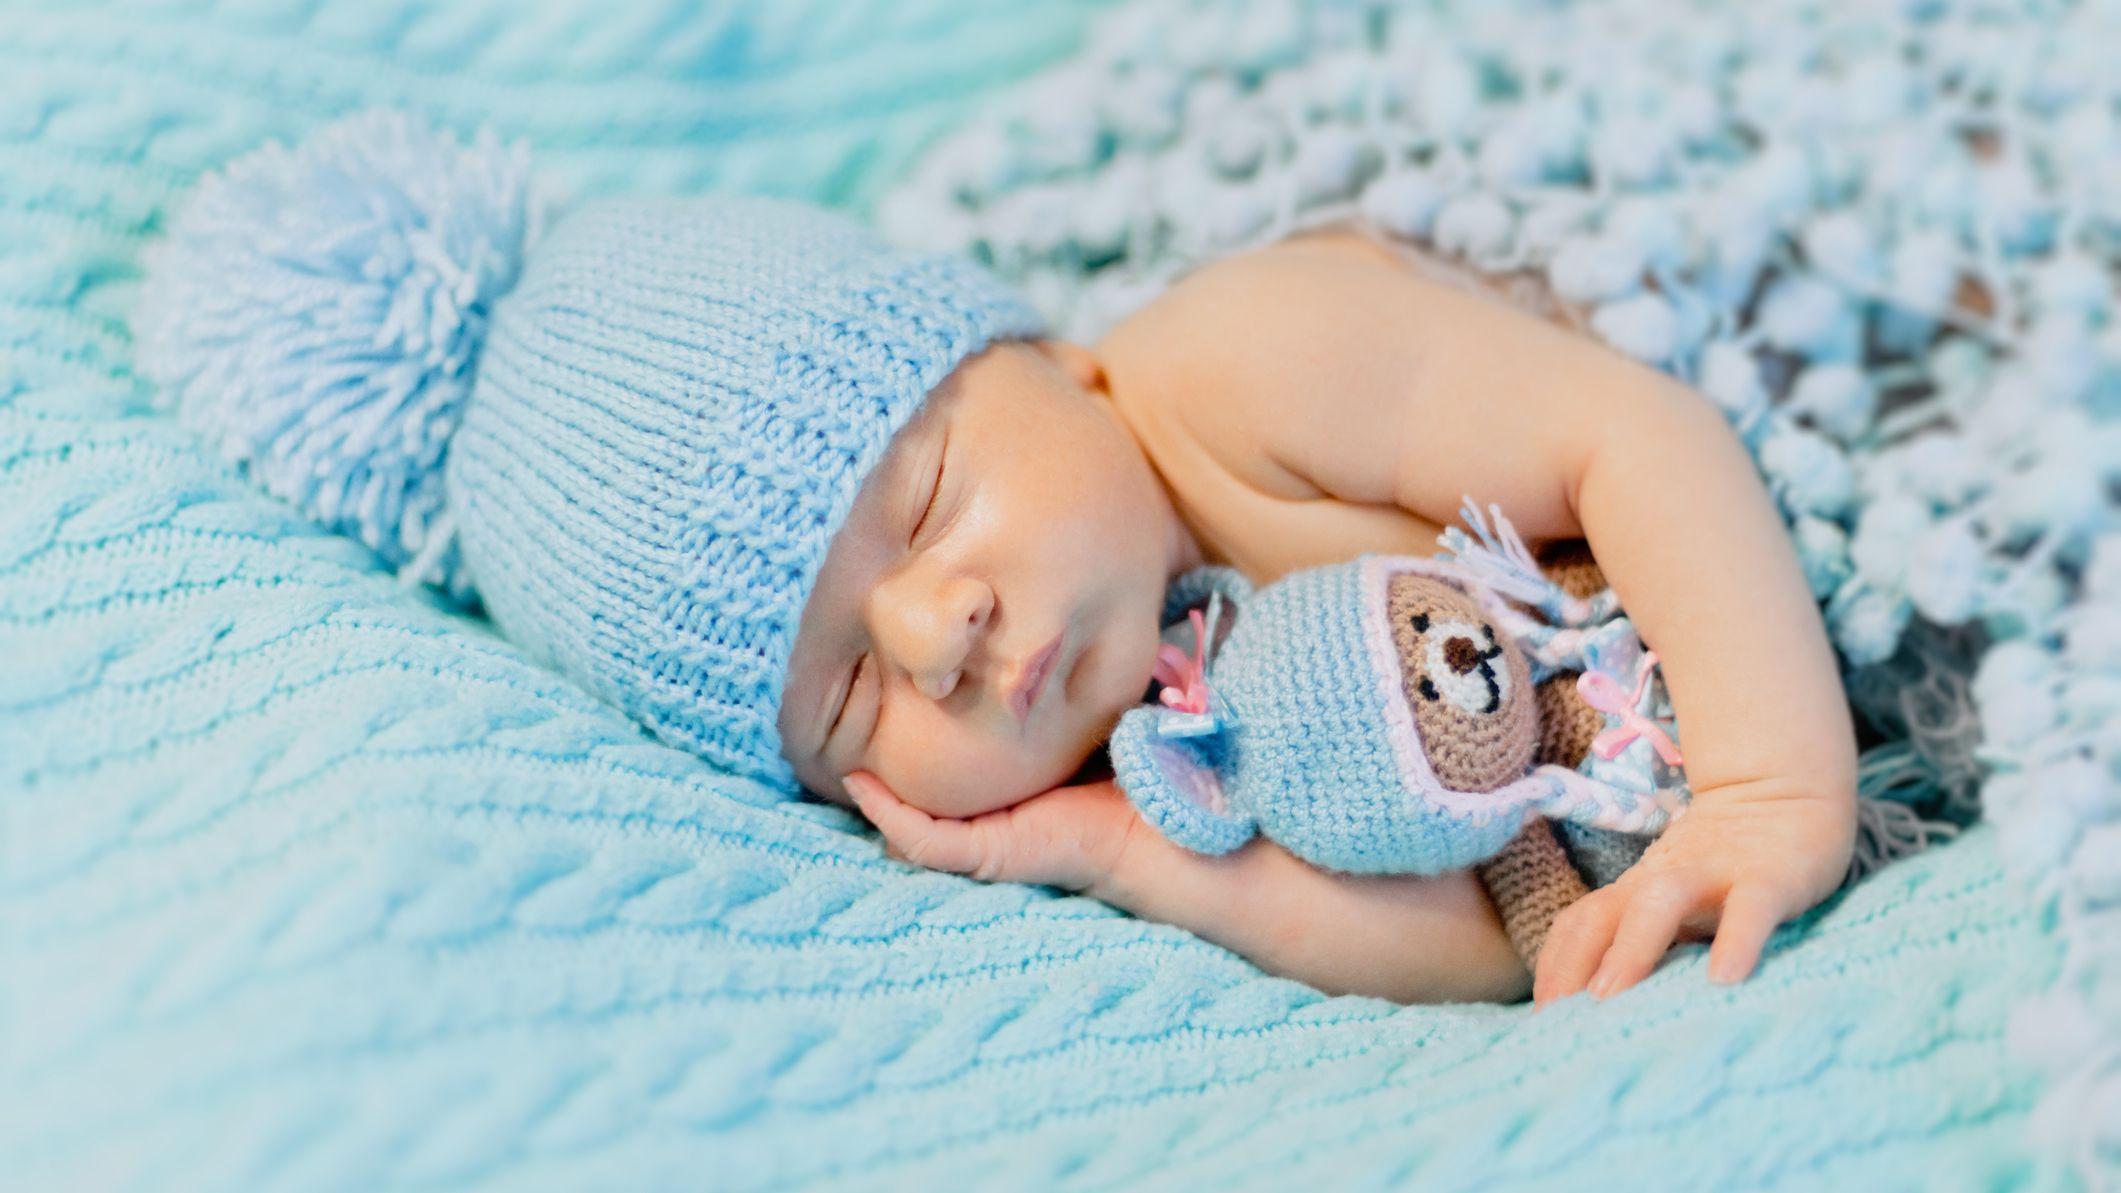 ivf baby blue boy bib in vitro fertilization embryo gift